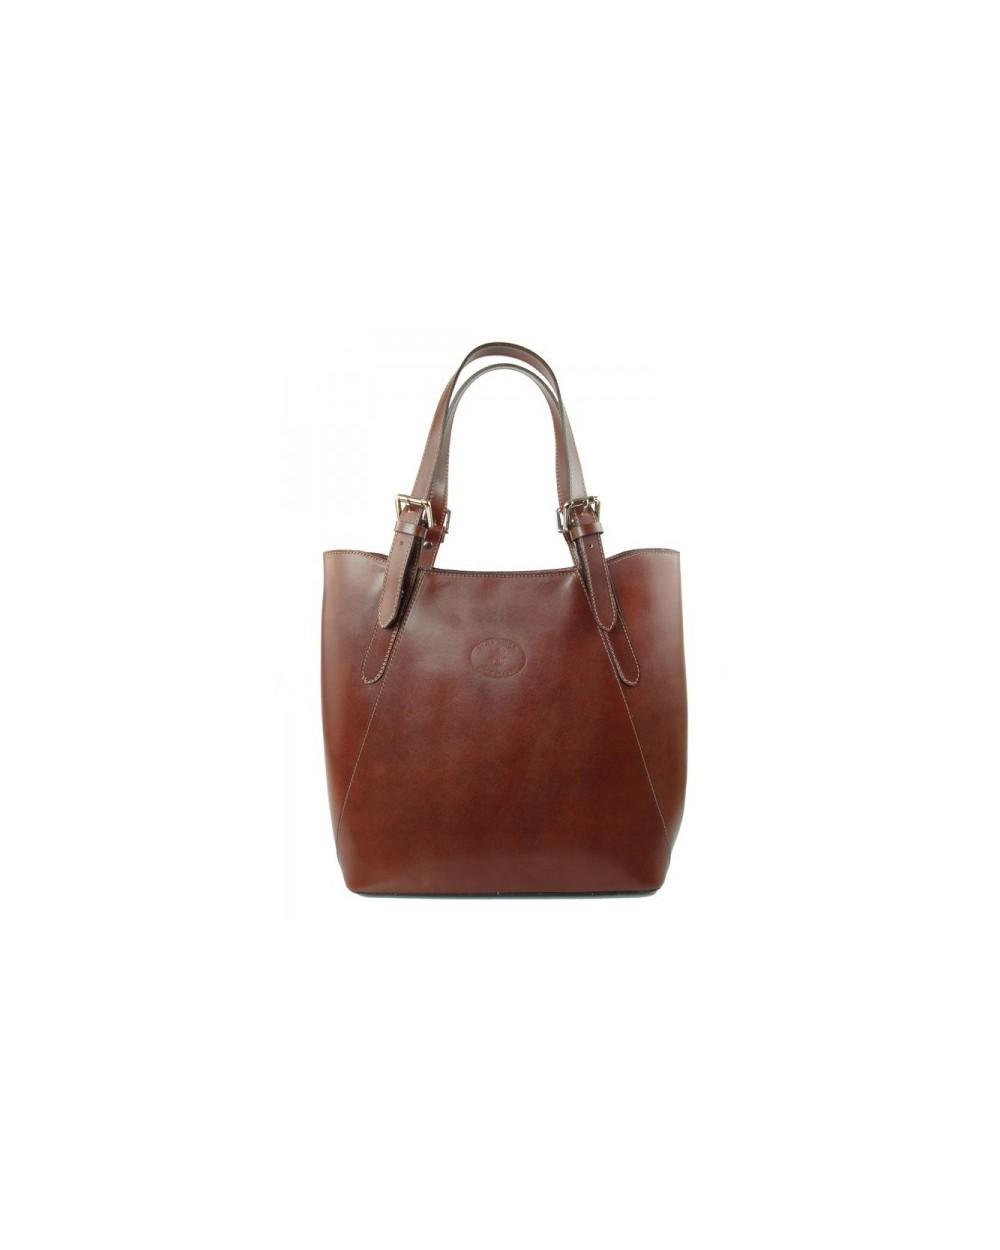 Shopper bag włoska torebka skórzana A4 Brązowa